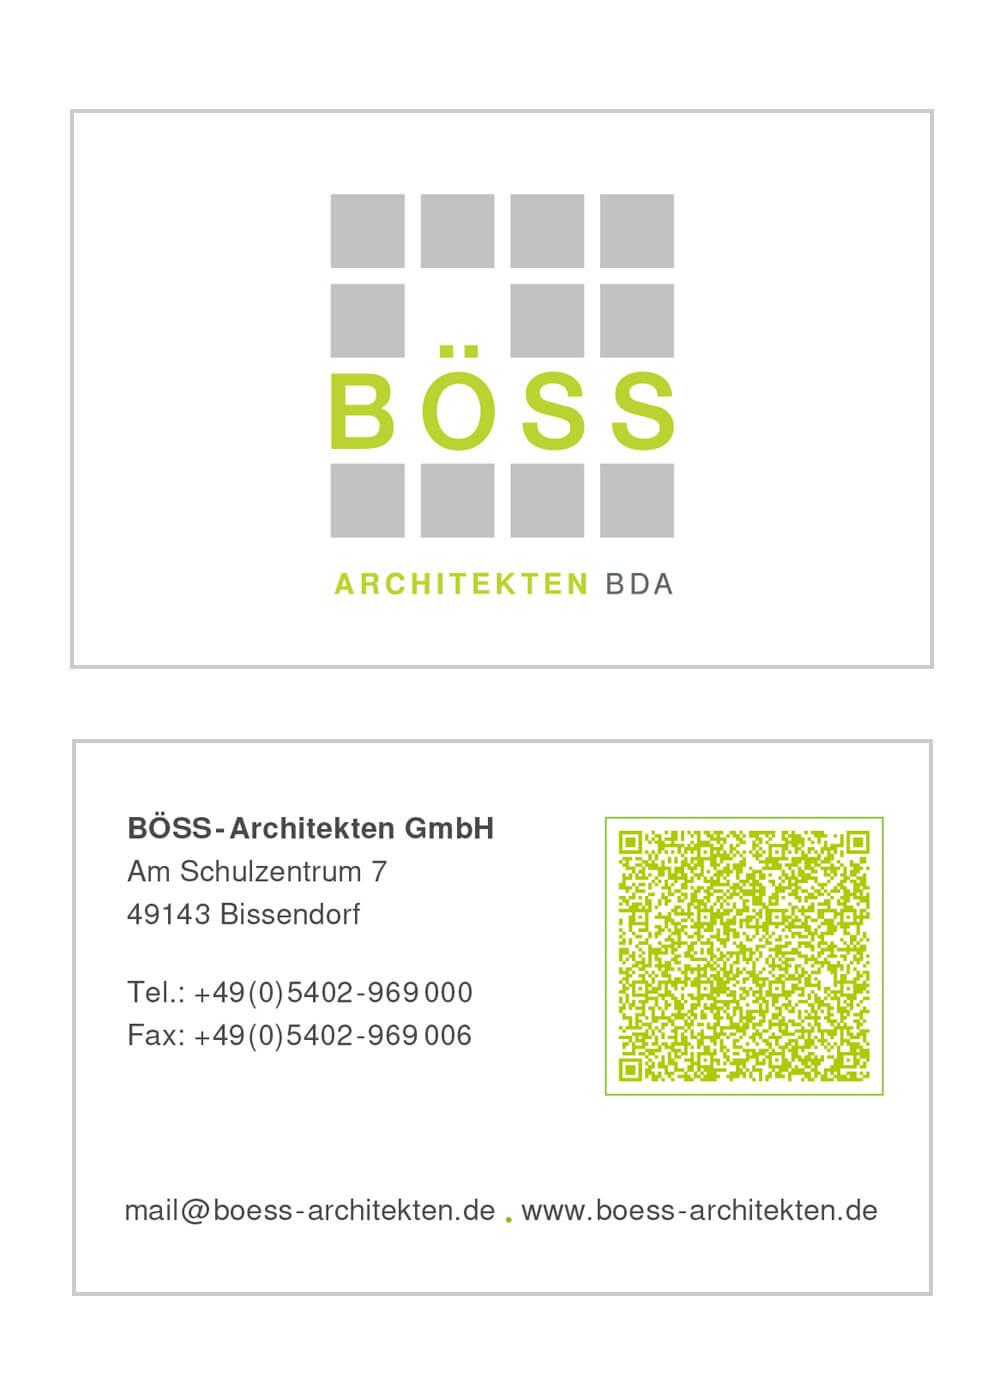 Visitenkarte BÖSS-Architekten GmbH